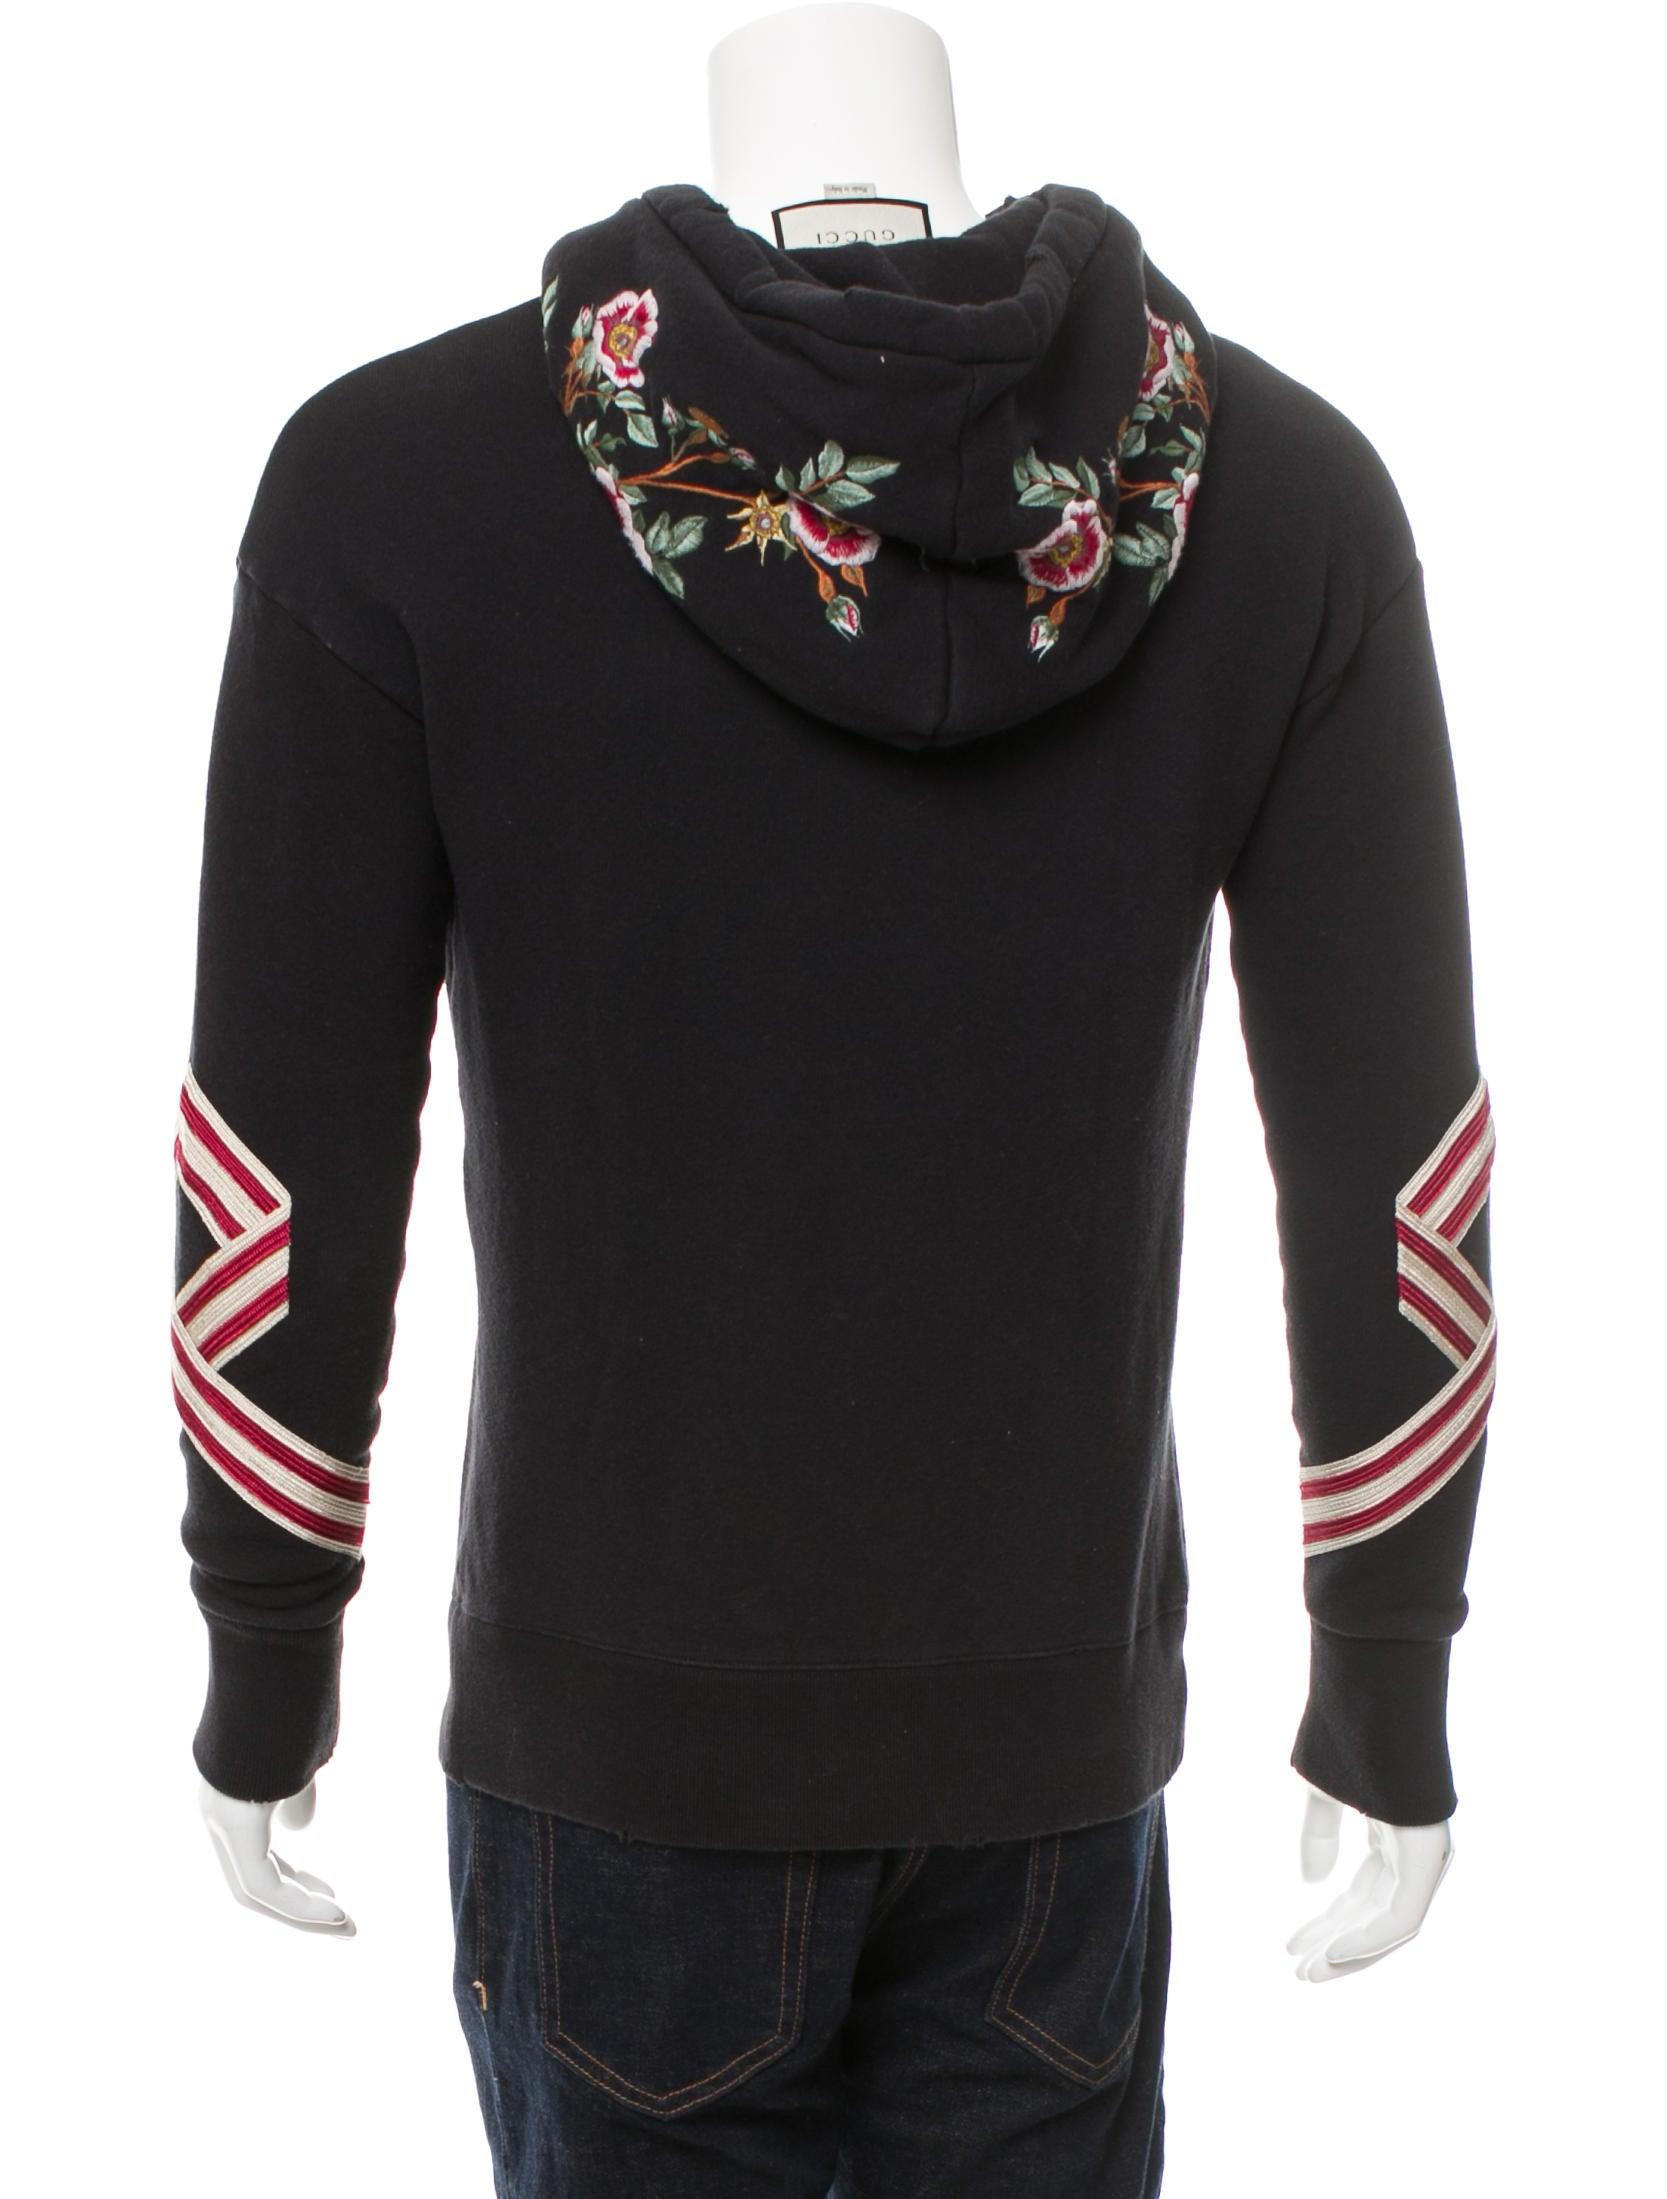 2017 Floral-Embroidered Sweatshirt